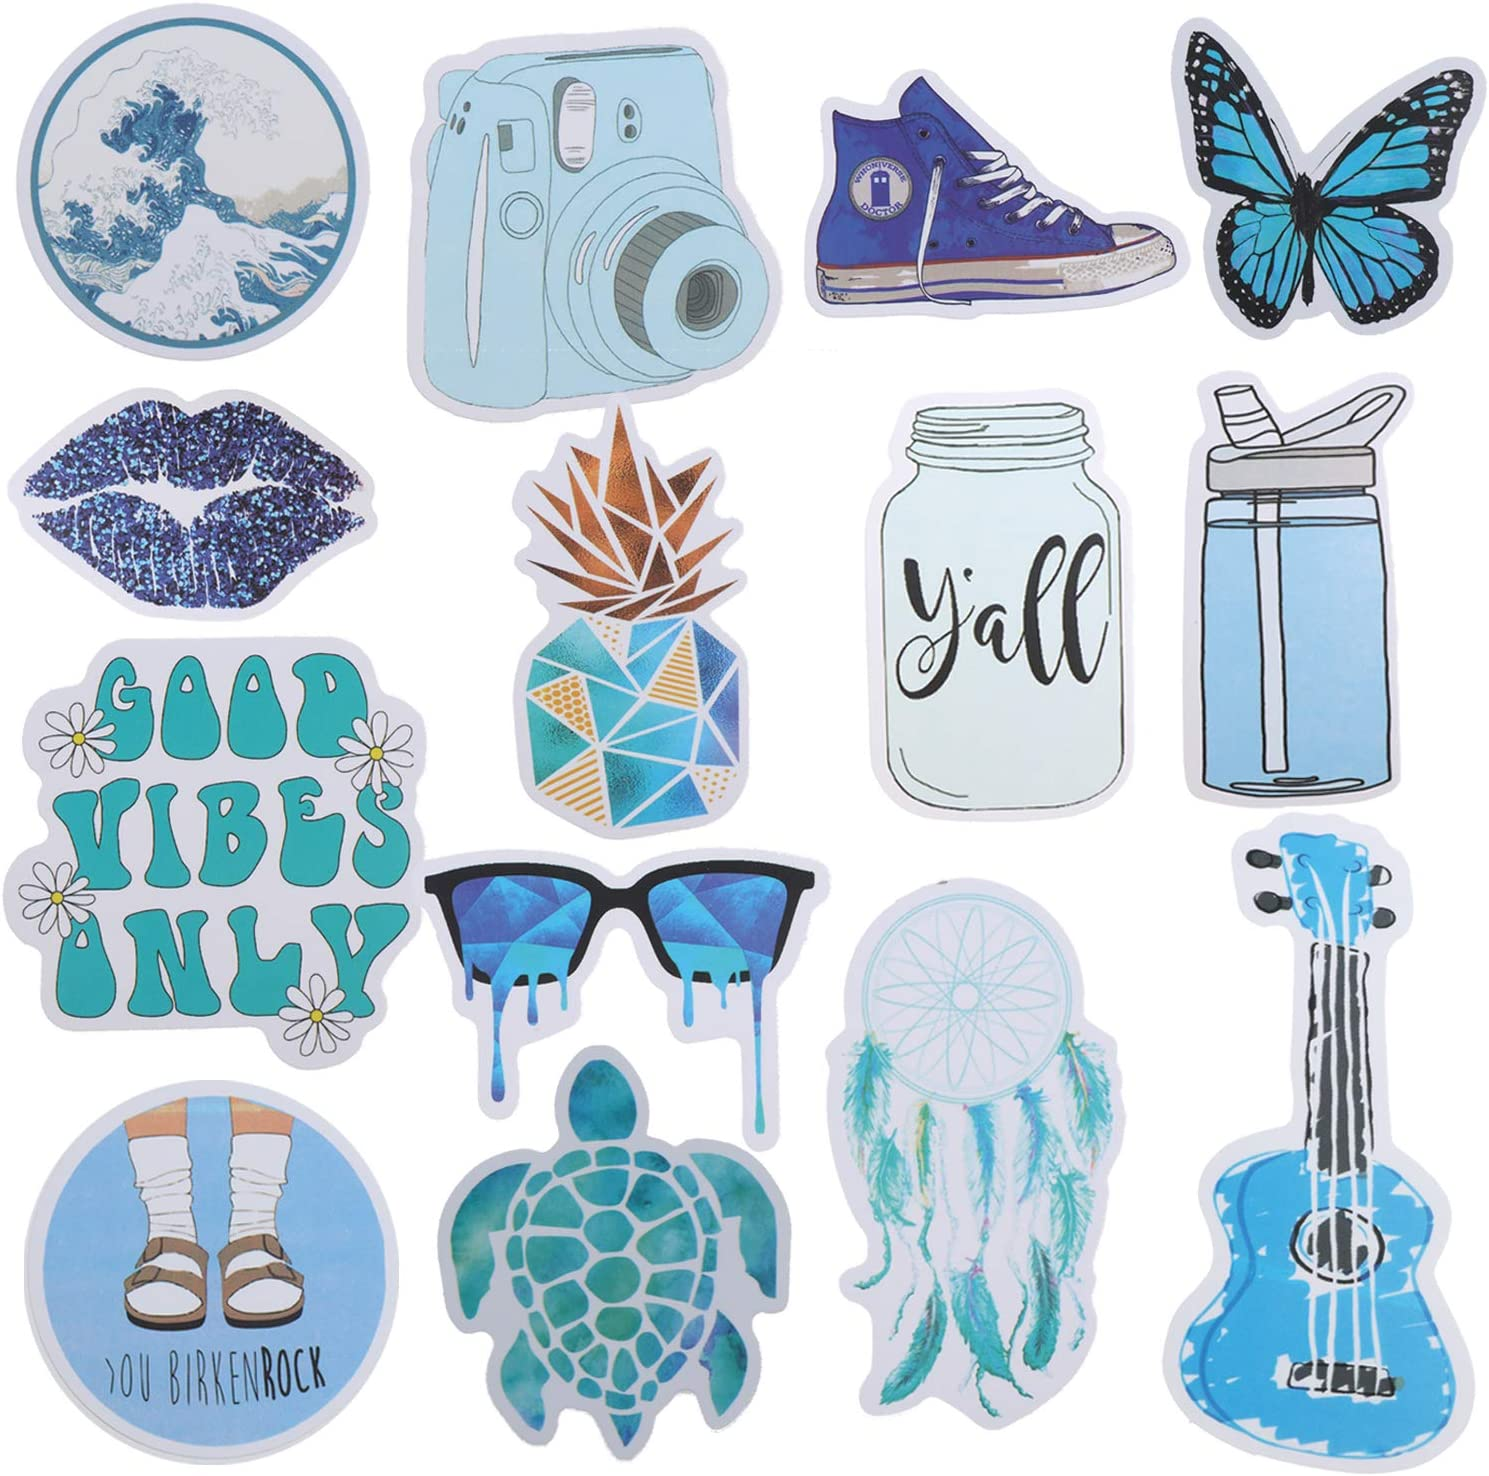 Omigga 50pcs Blue Waterproof Vinyl Sticker Cute Girls Butterfly Lips Bunny Ocean Stickers for Water Bottle Luggage Room Decoration (Style 1)